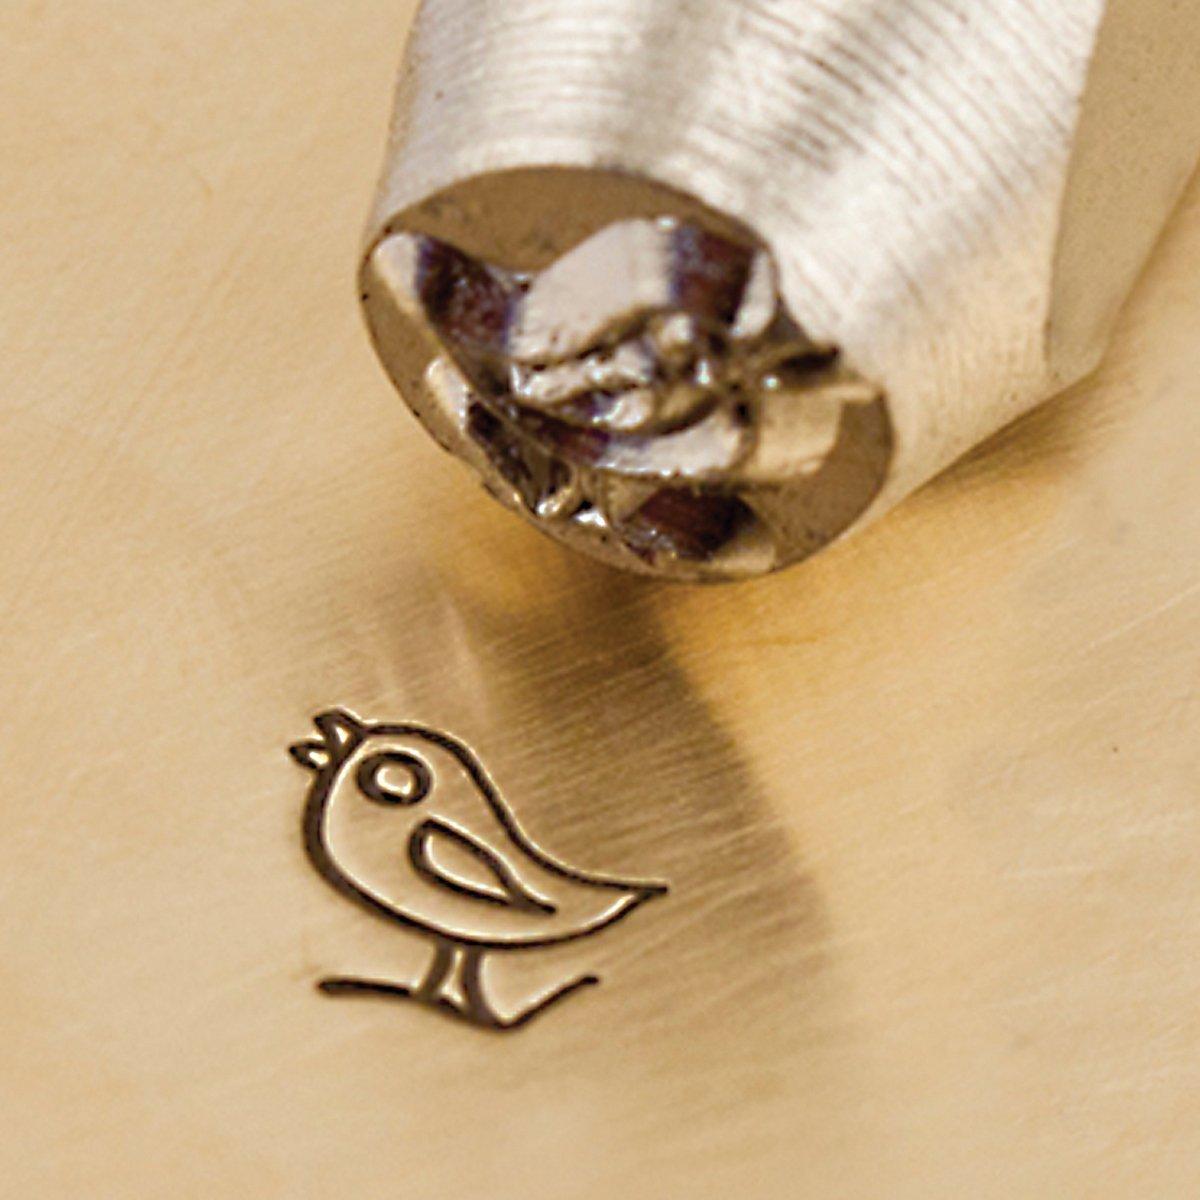 Song Bird Design Stamp 6mm ImpressArt